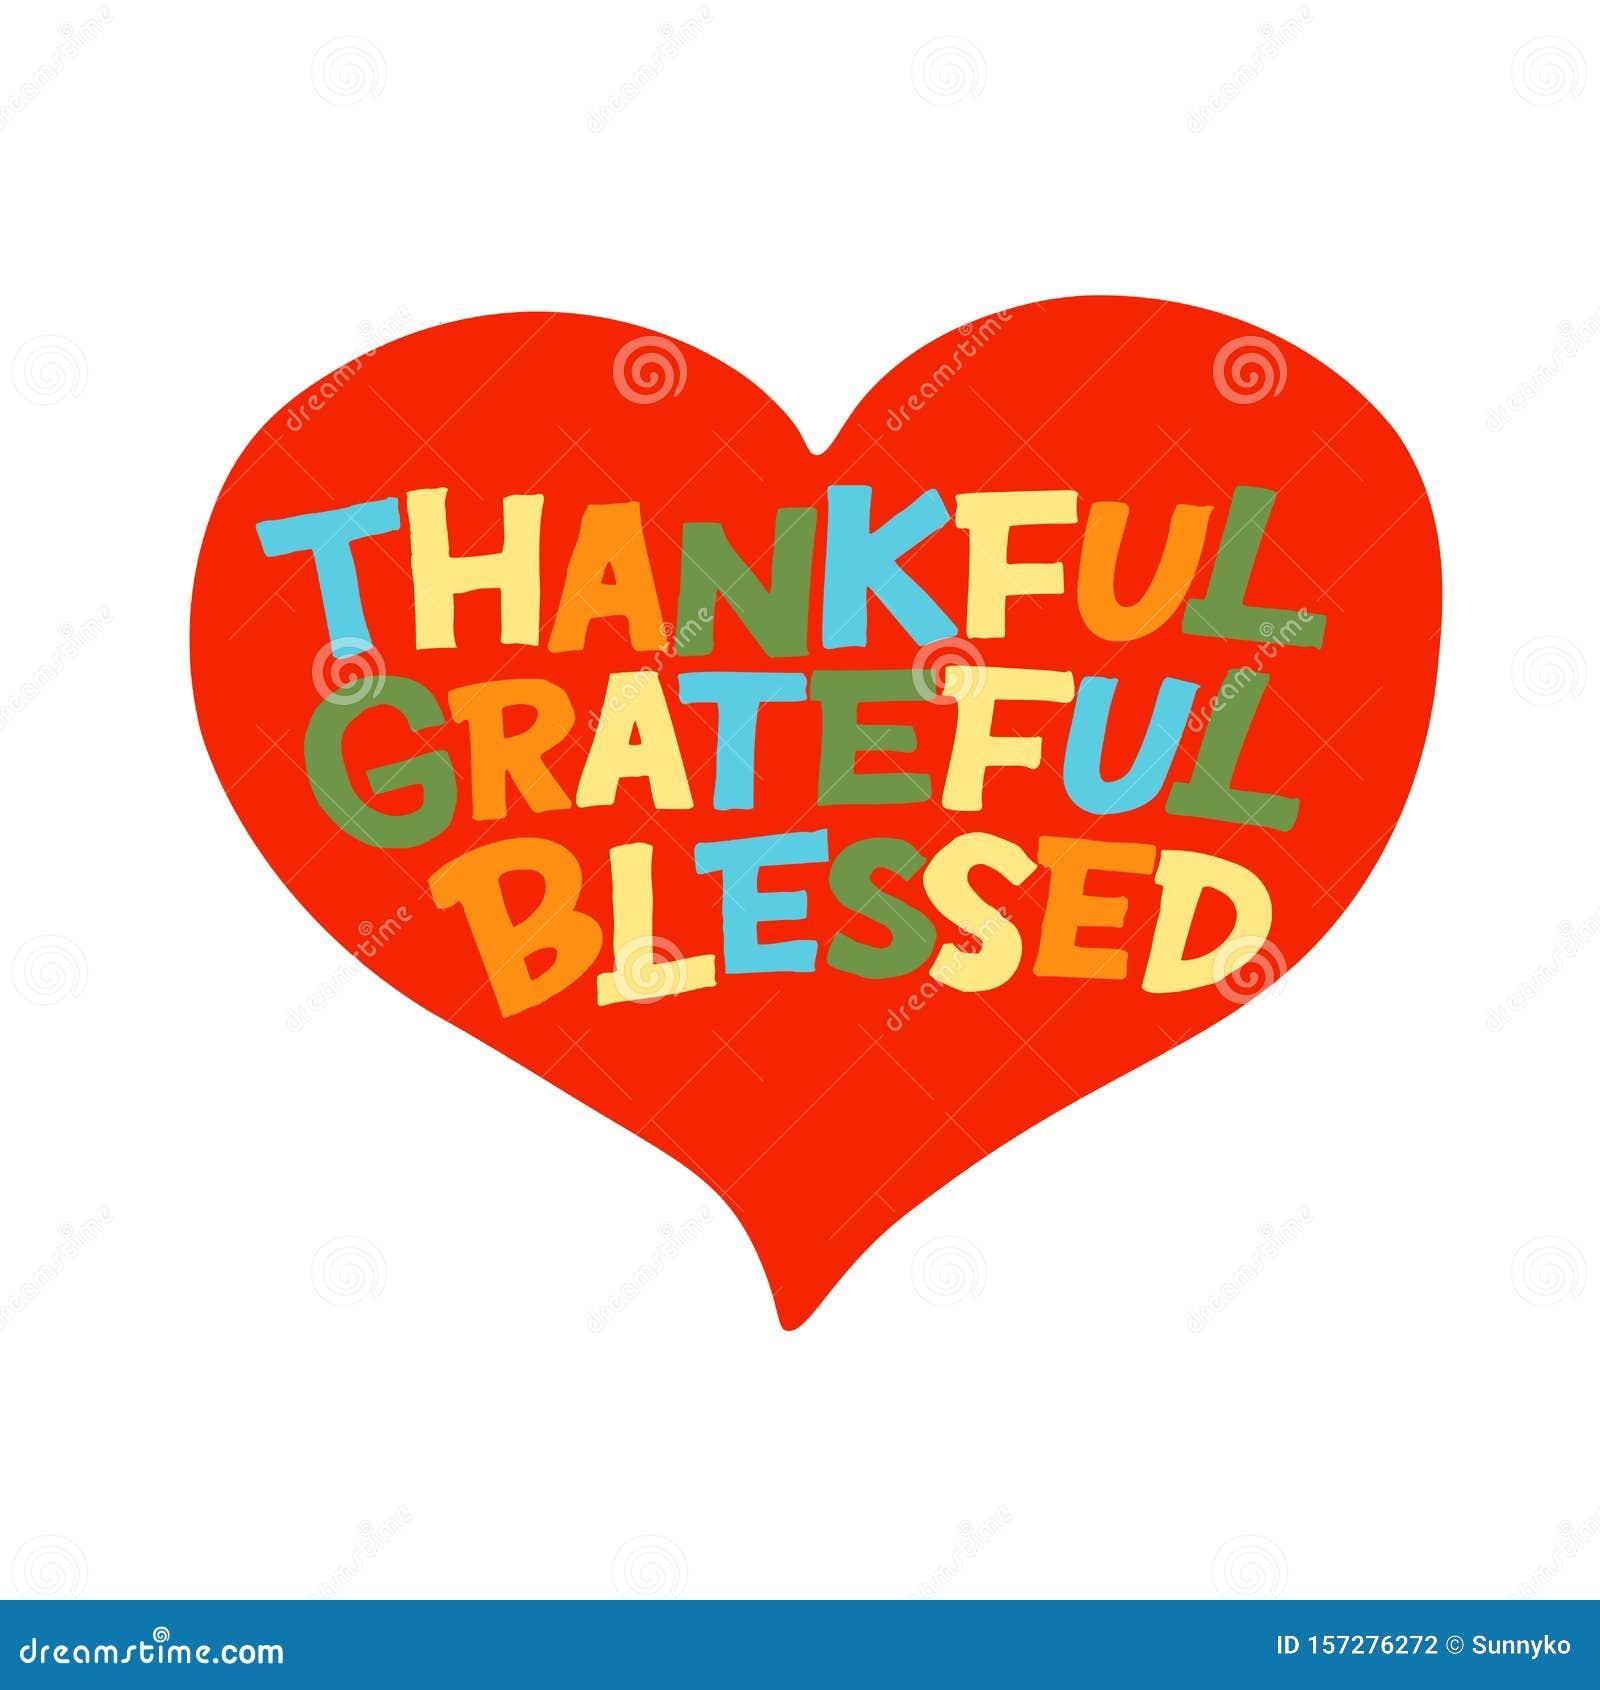 Grateful scripture heart about Psalm 138